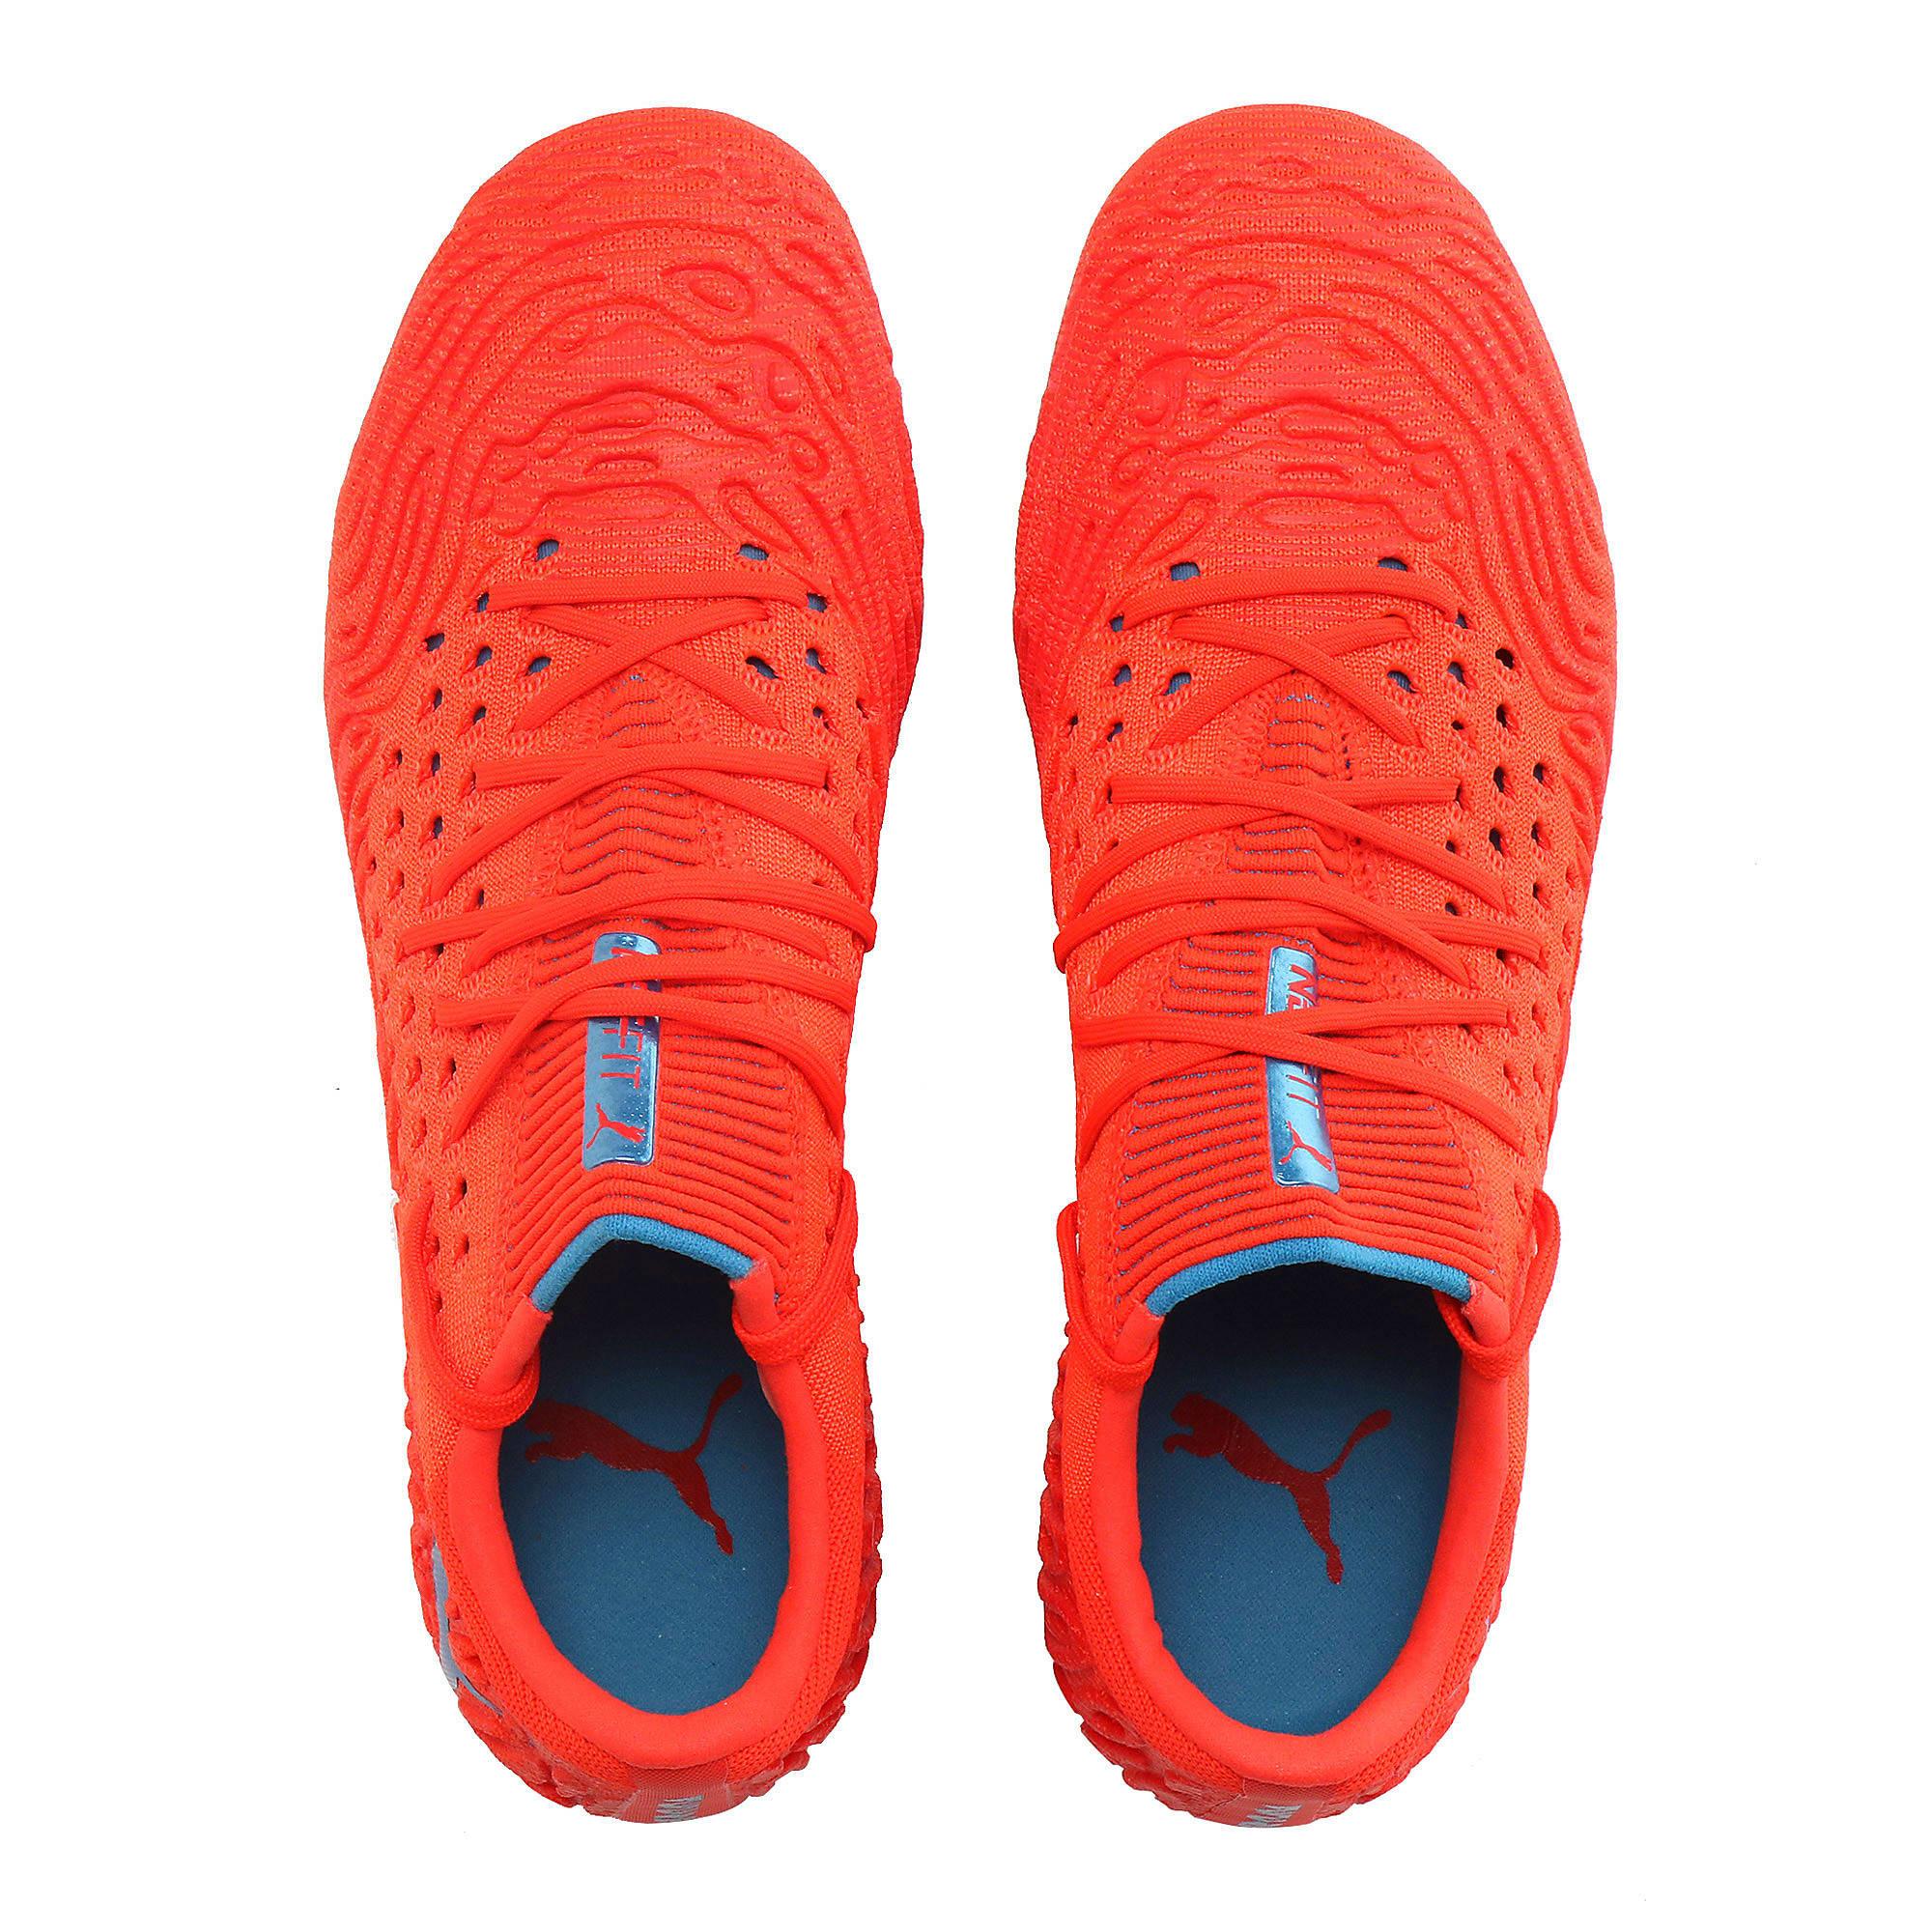 Thumbnail 6 of FUTURE 19.1 NETFIT Lo FG/AG Men's Soccer Cleats, Red Blast-Bleu Azur, medium